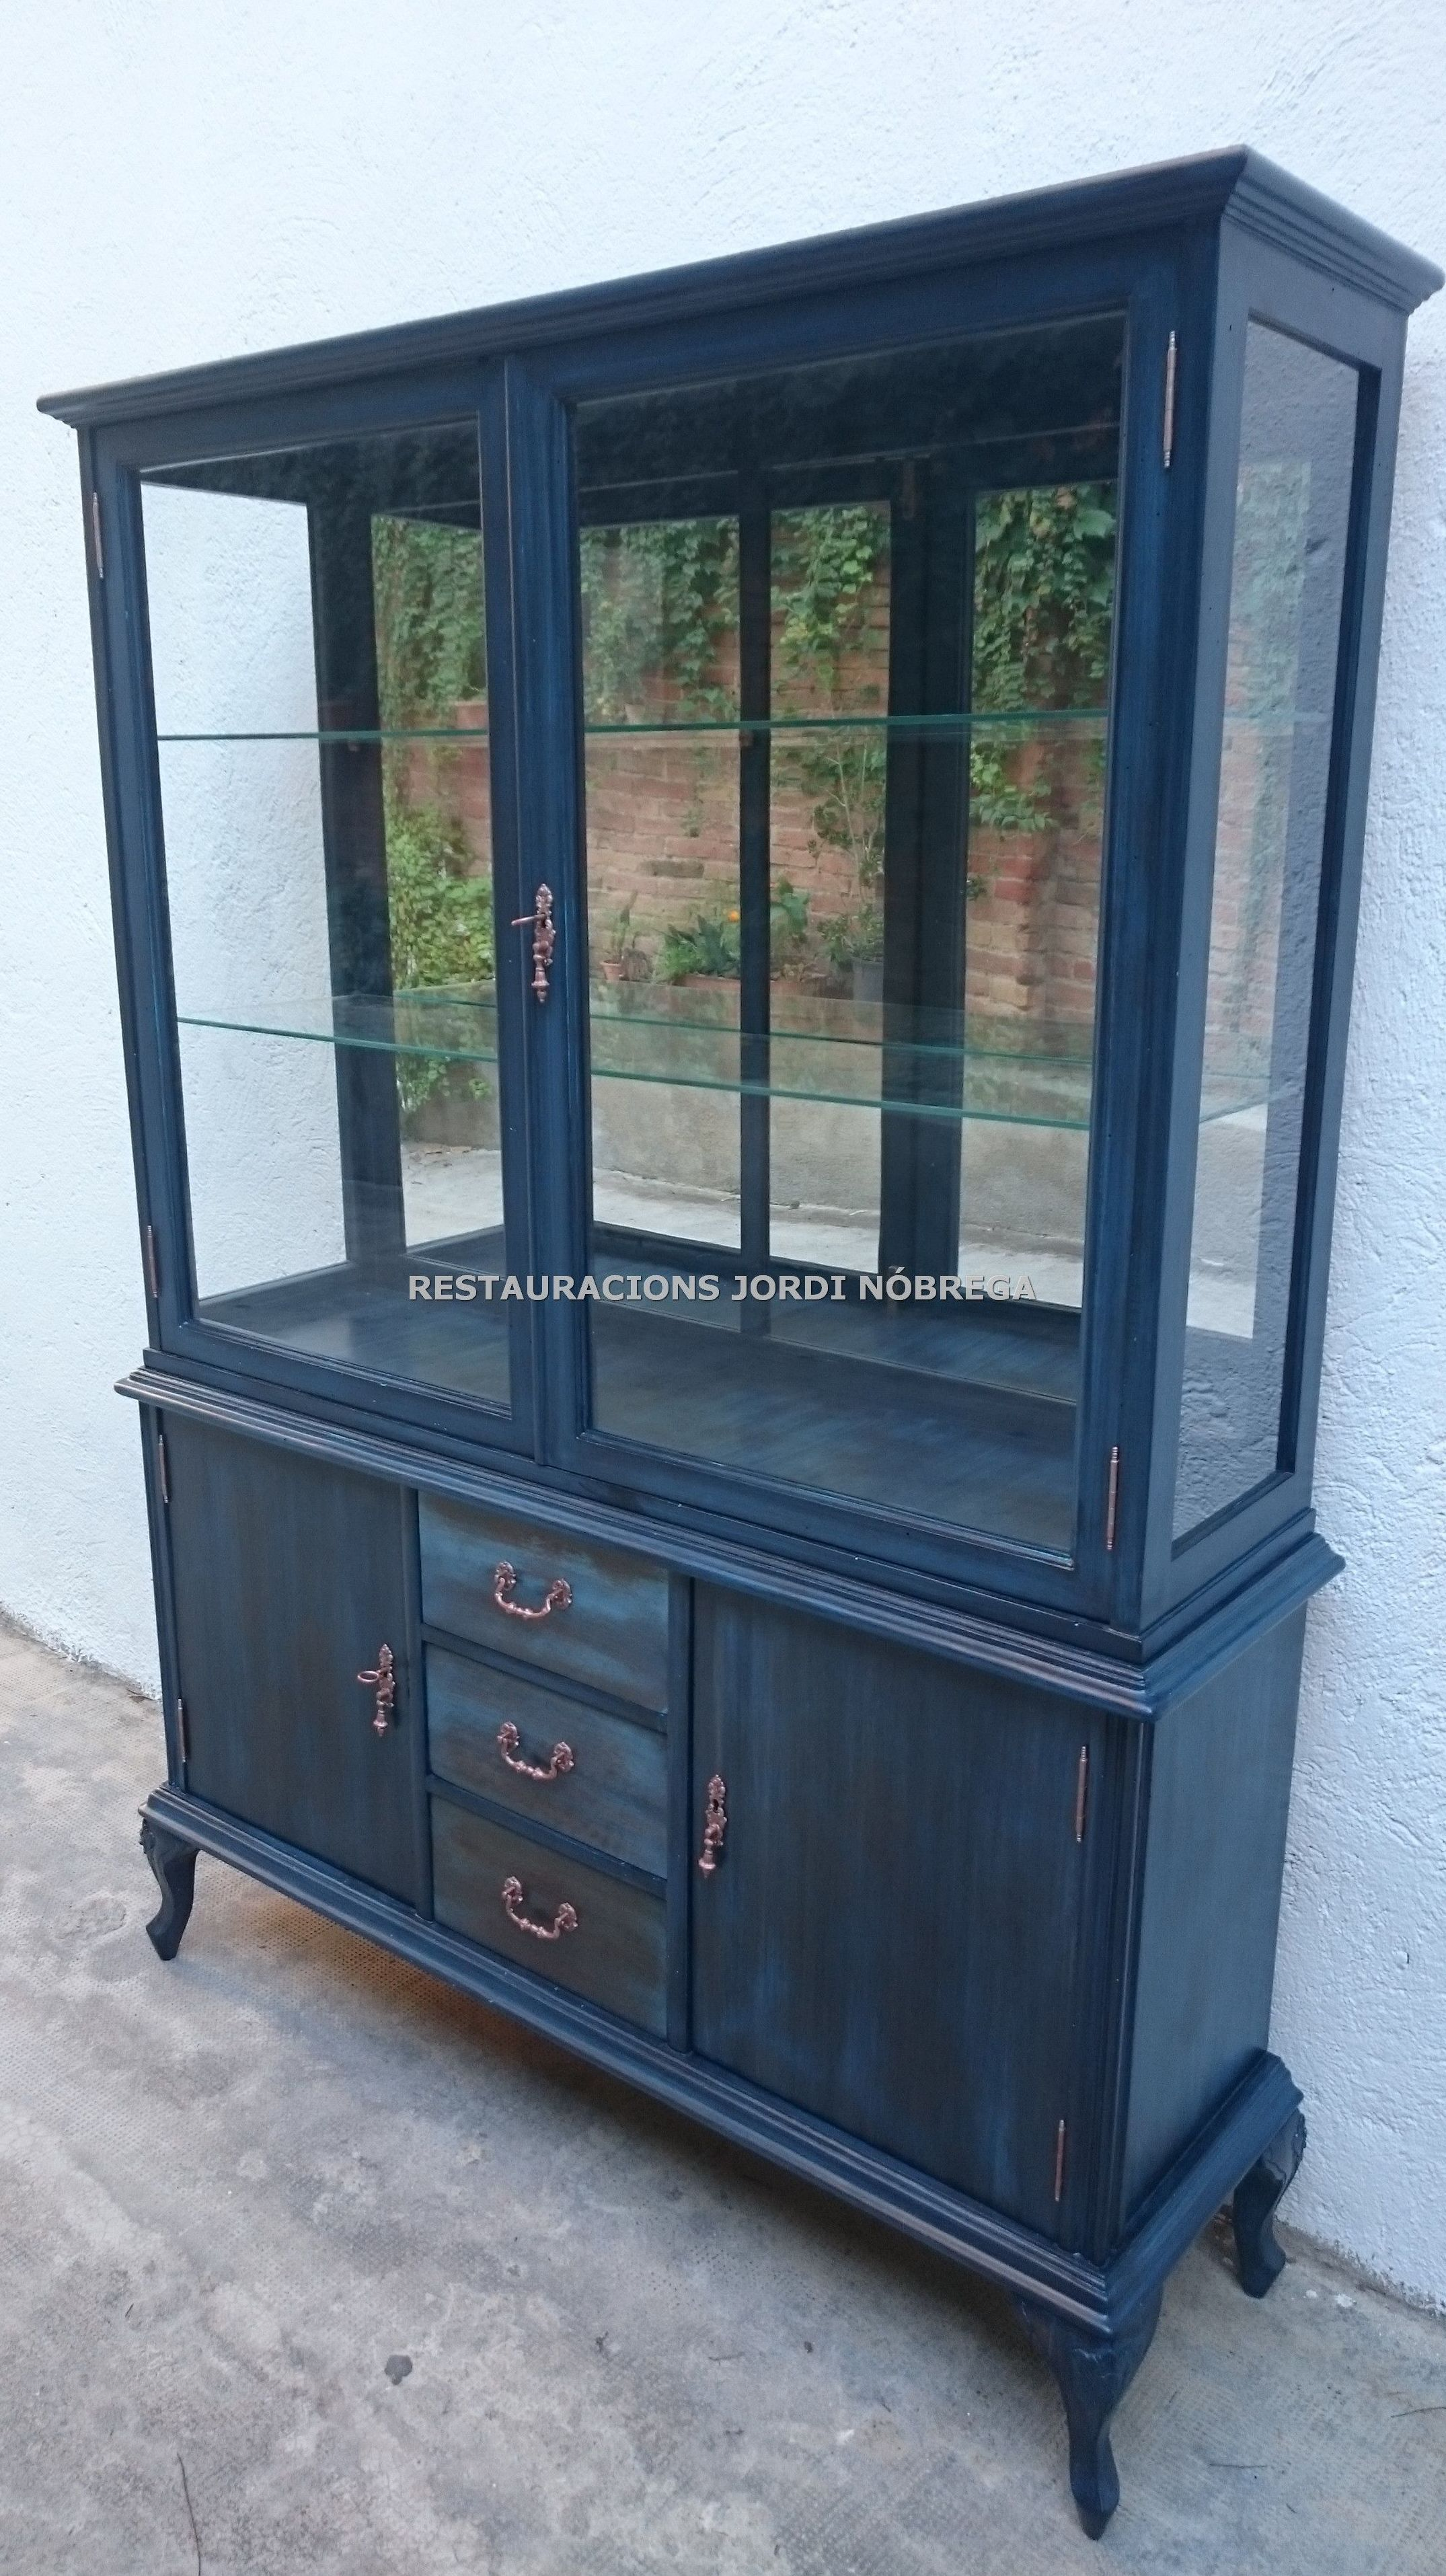 Restauraci n muebles vintage en barcelona servicios y - Muebles vintage en barcelona ...